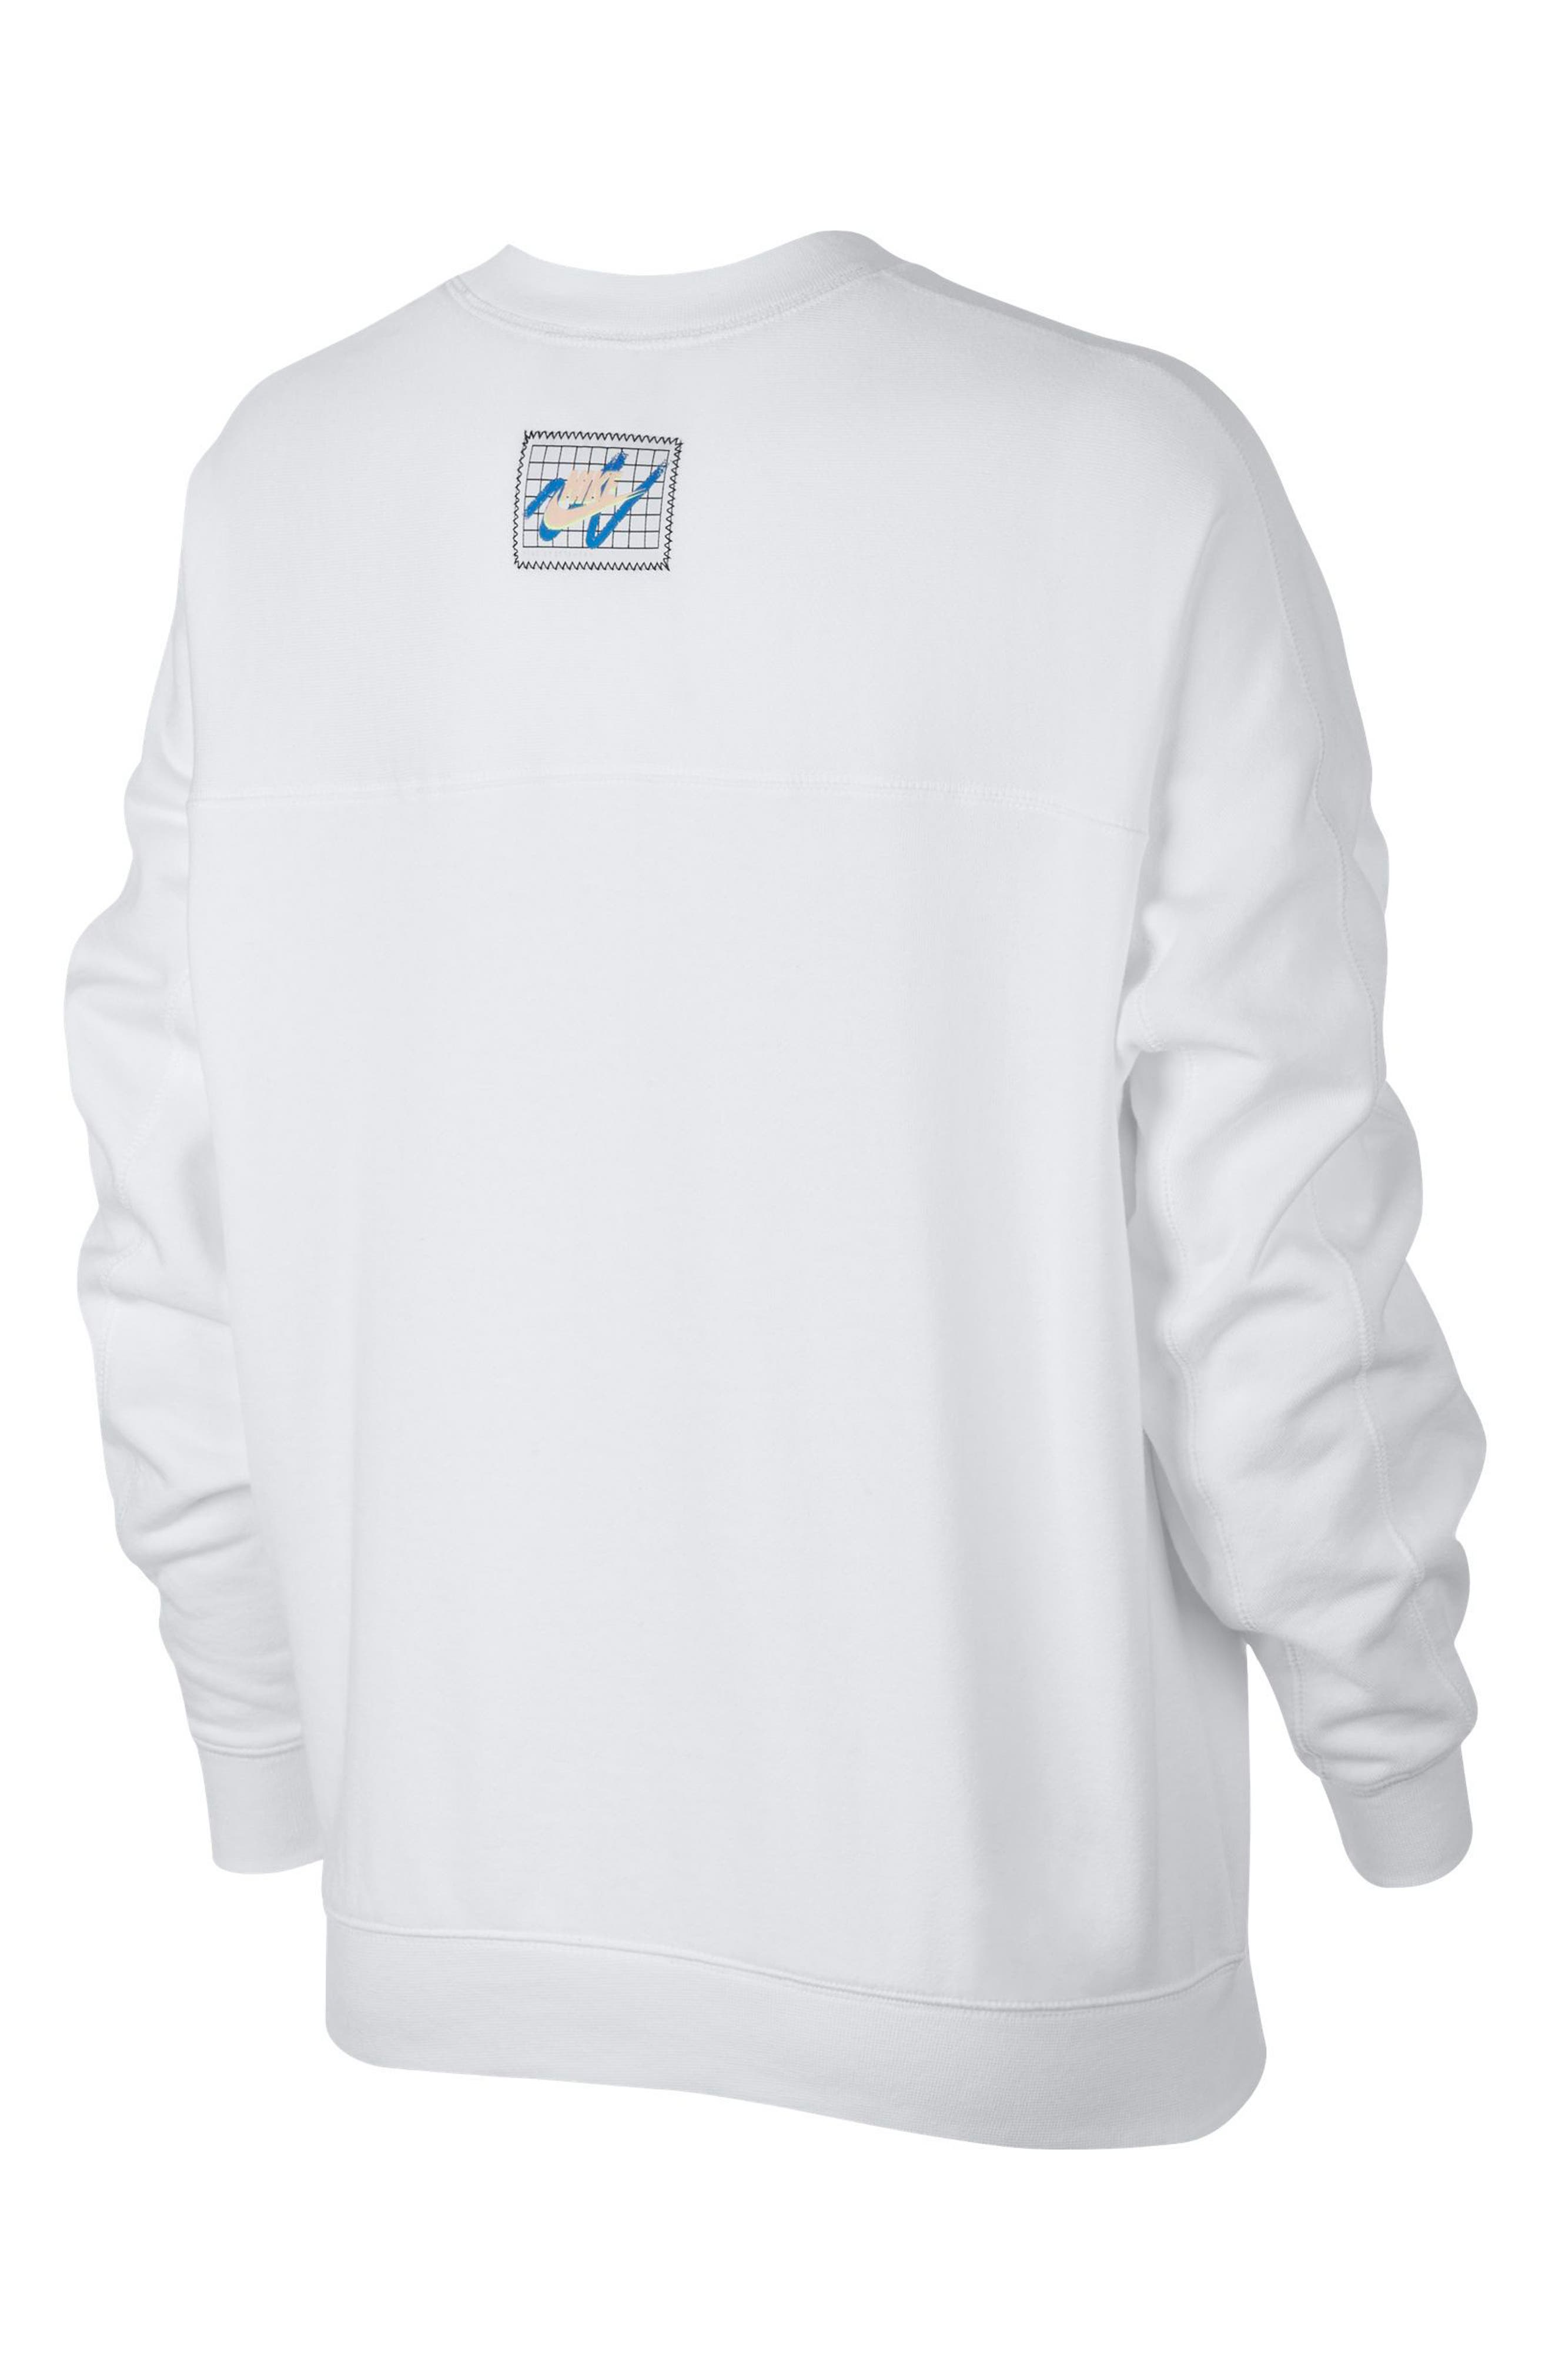 Sportswear Archive Women's Long Sleeve Crewneck Tee,                             Alternate thumbnail 2, color,                             WHITE/ WHITE/ WHITE